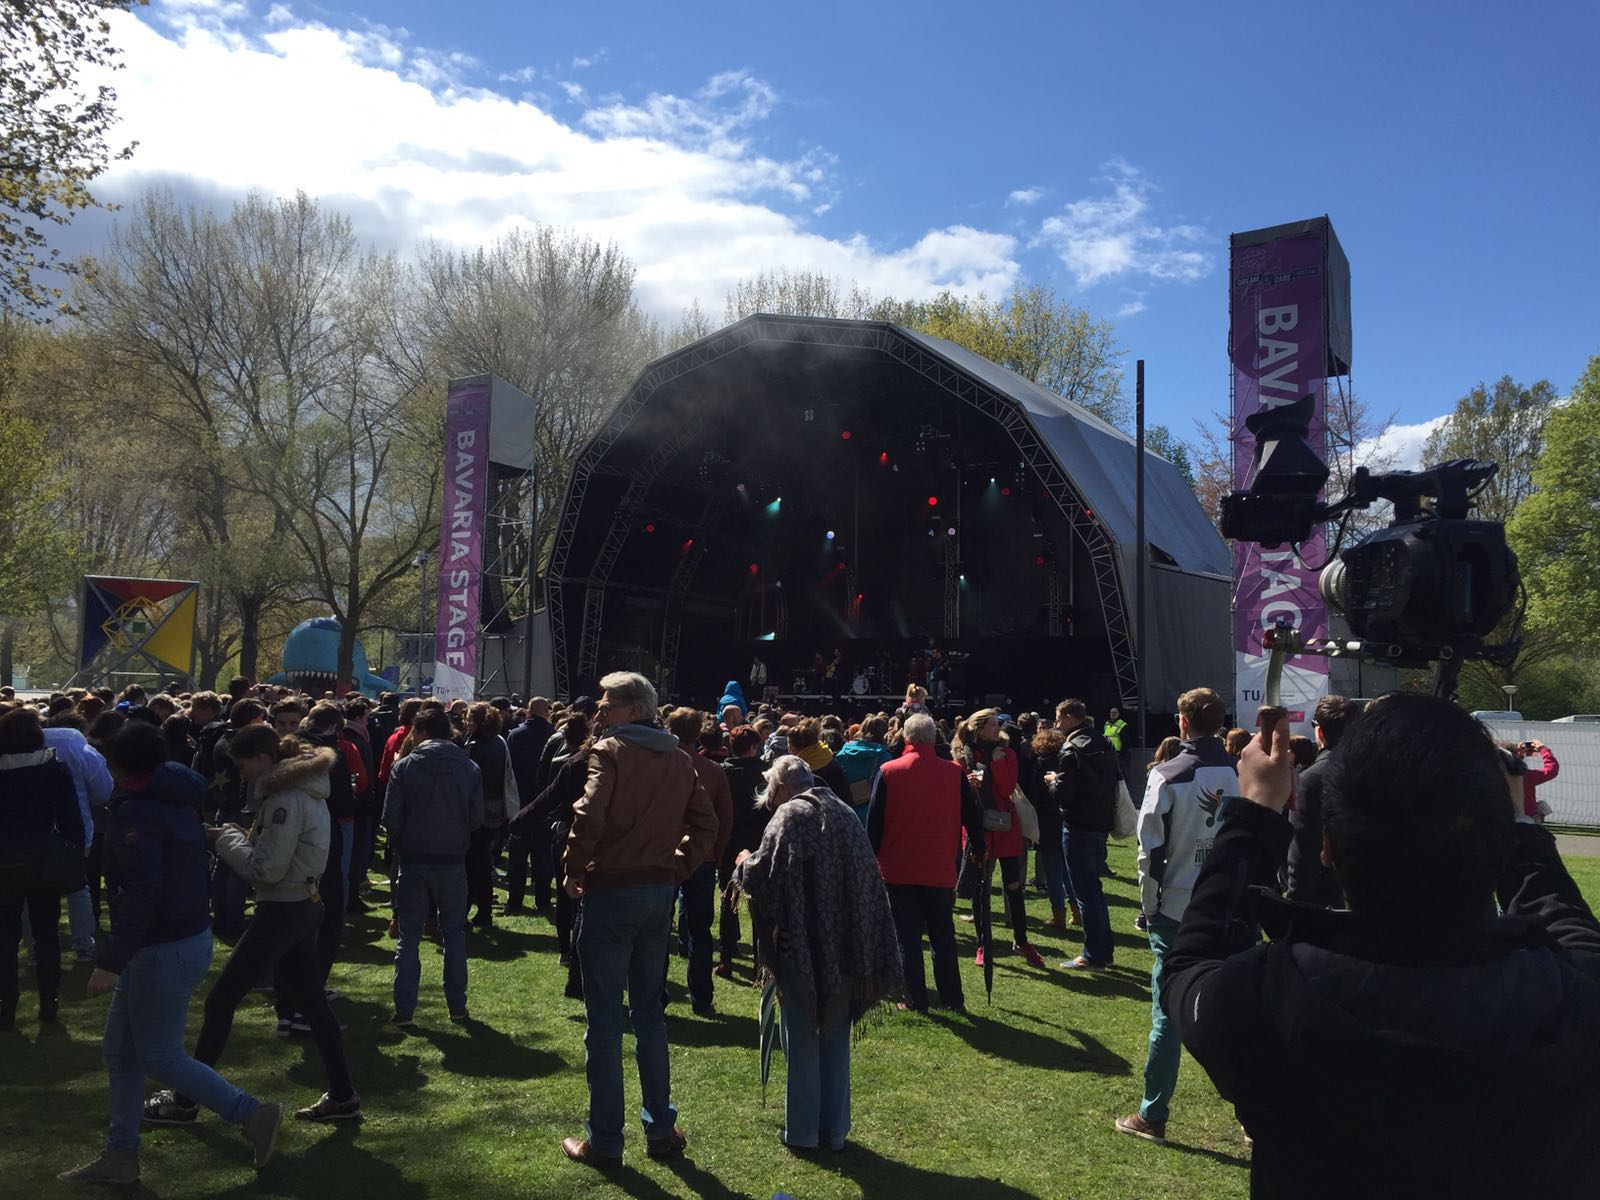 TUe festival